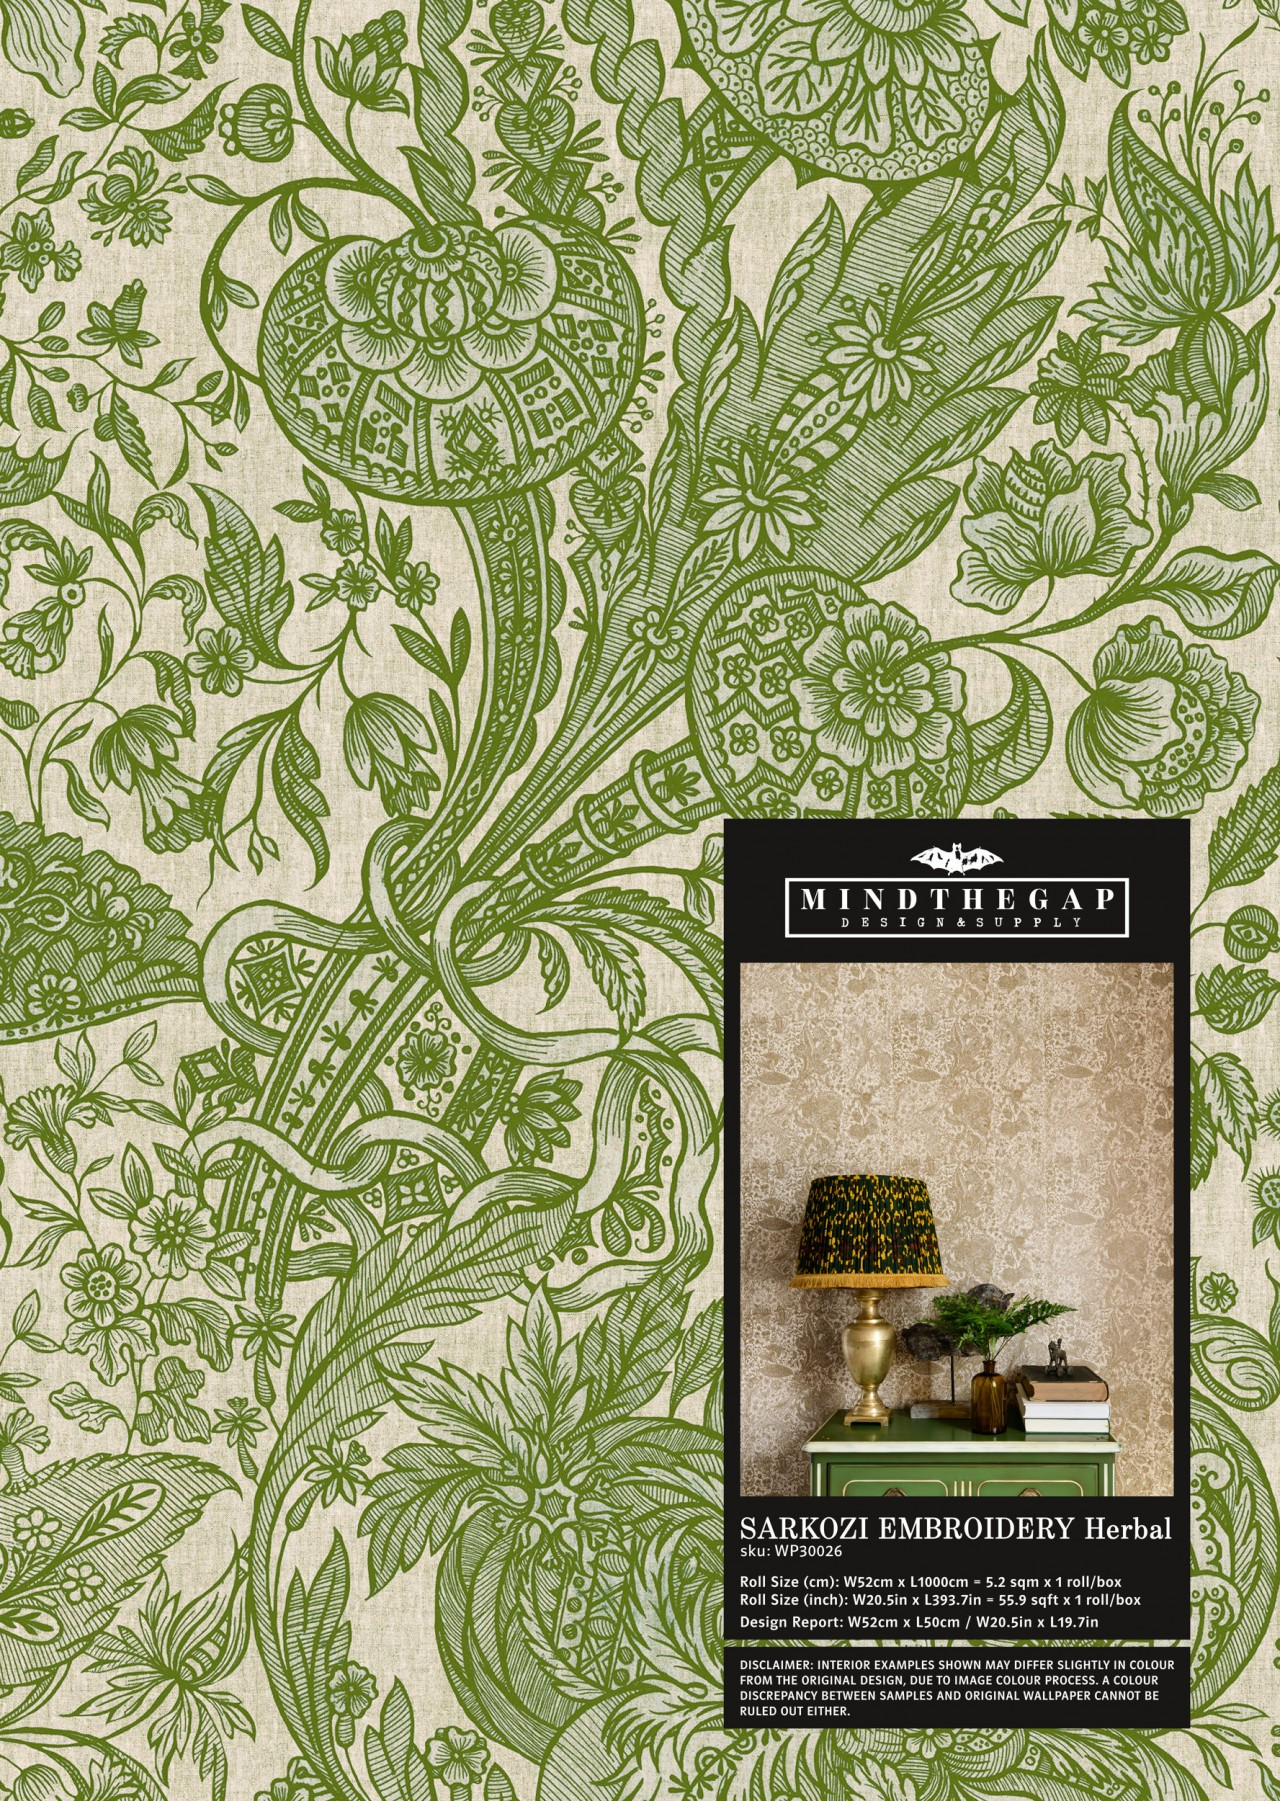 SARKOZI EMBROIDERY Herbal Wallpaper Sample